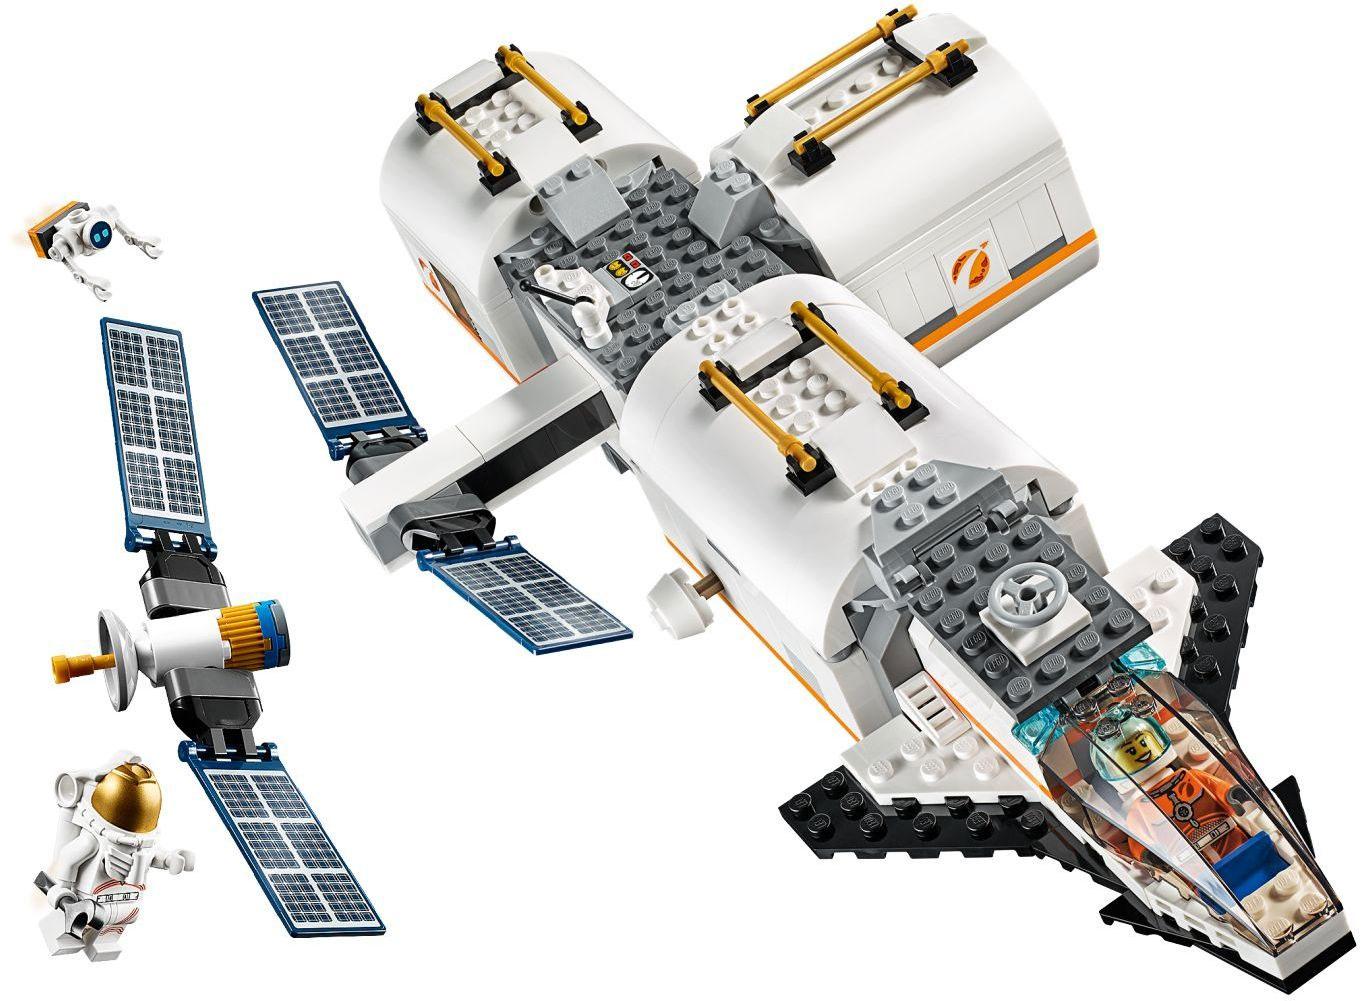 lego 60227 lunar space station - photo #8